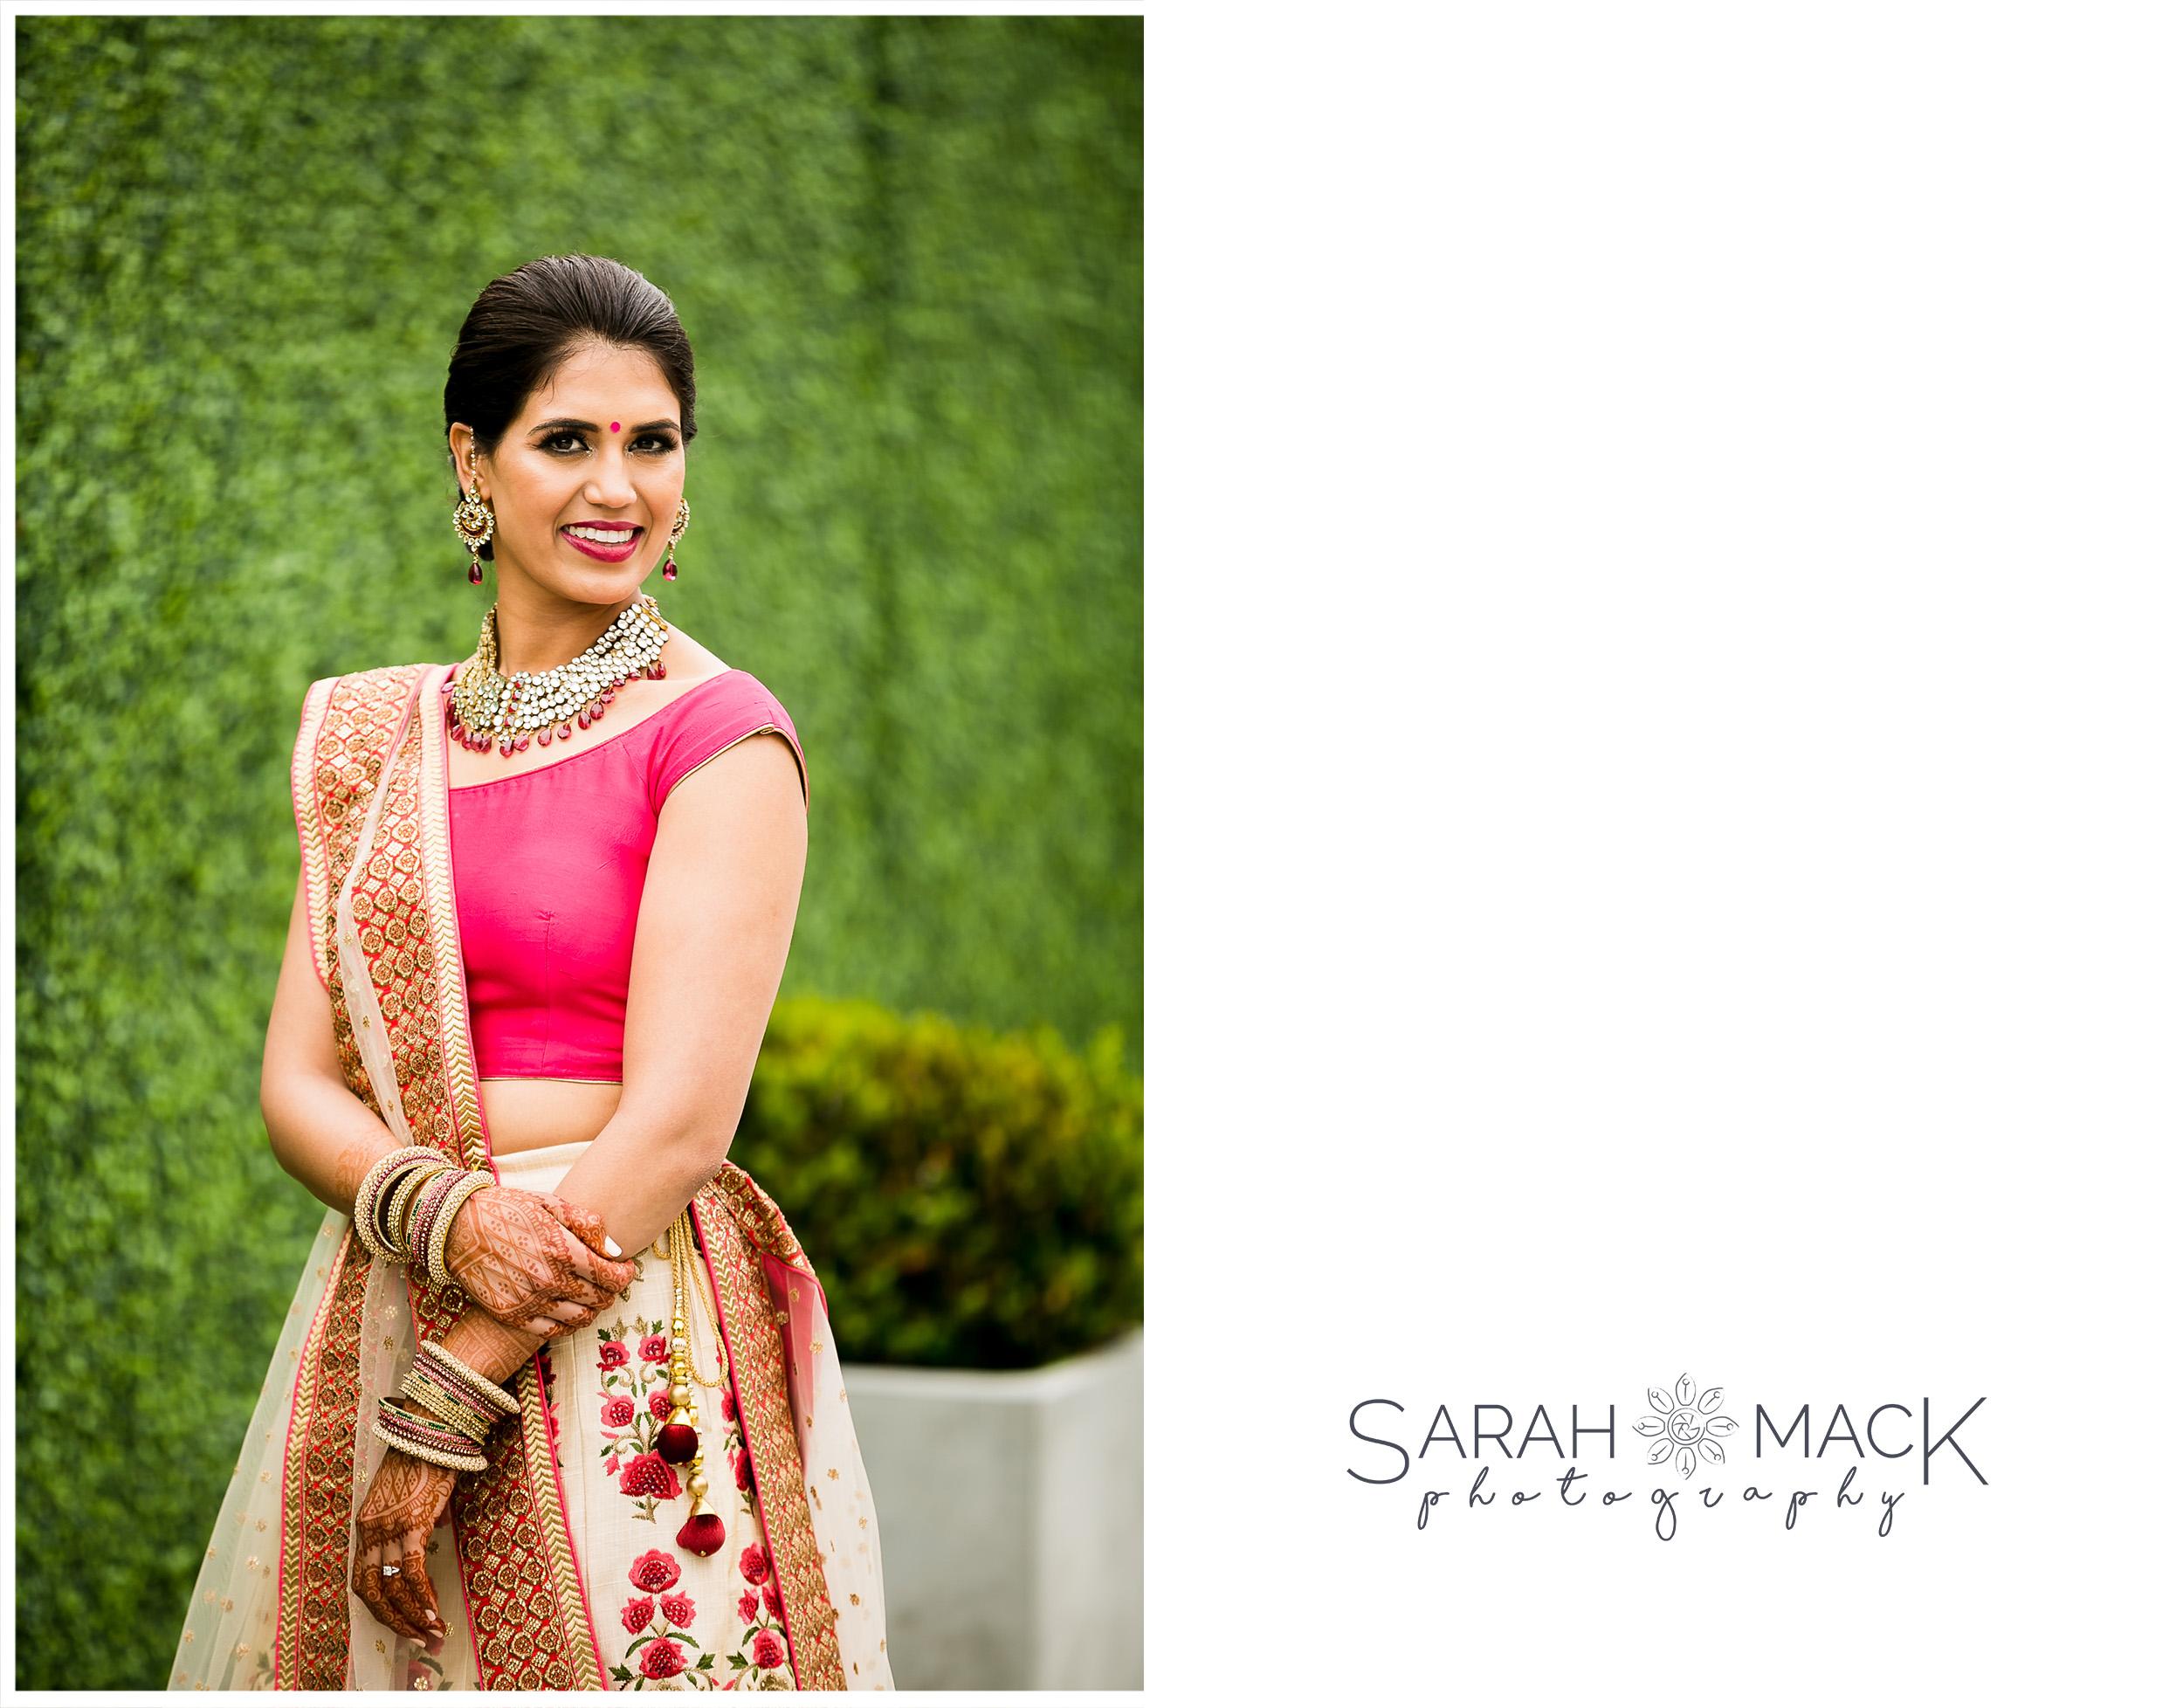 PR-Irvine-Ganesh-Pooja-Indian-Wedding-Photography-14.jpg